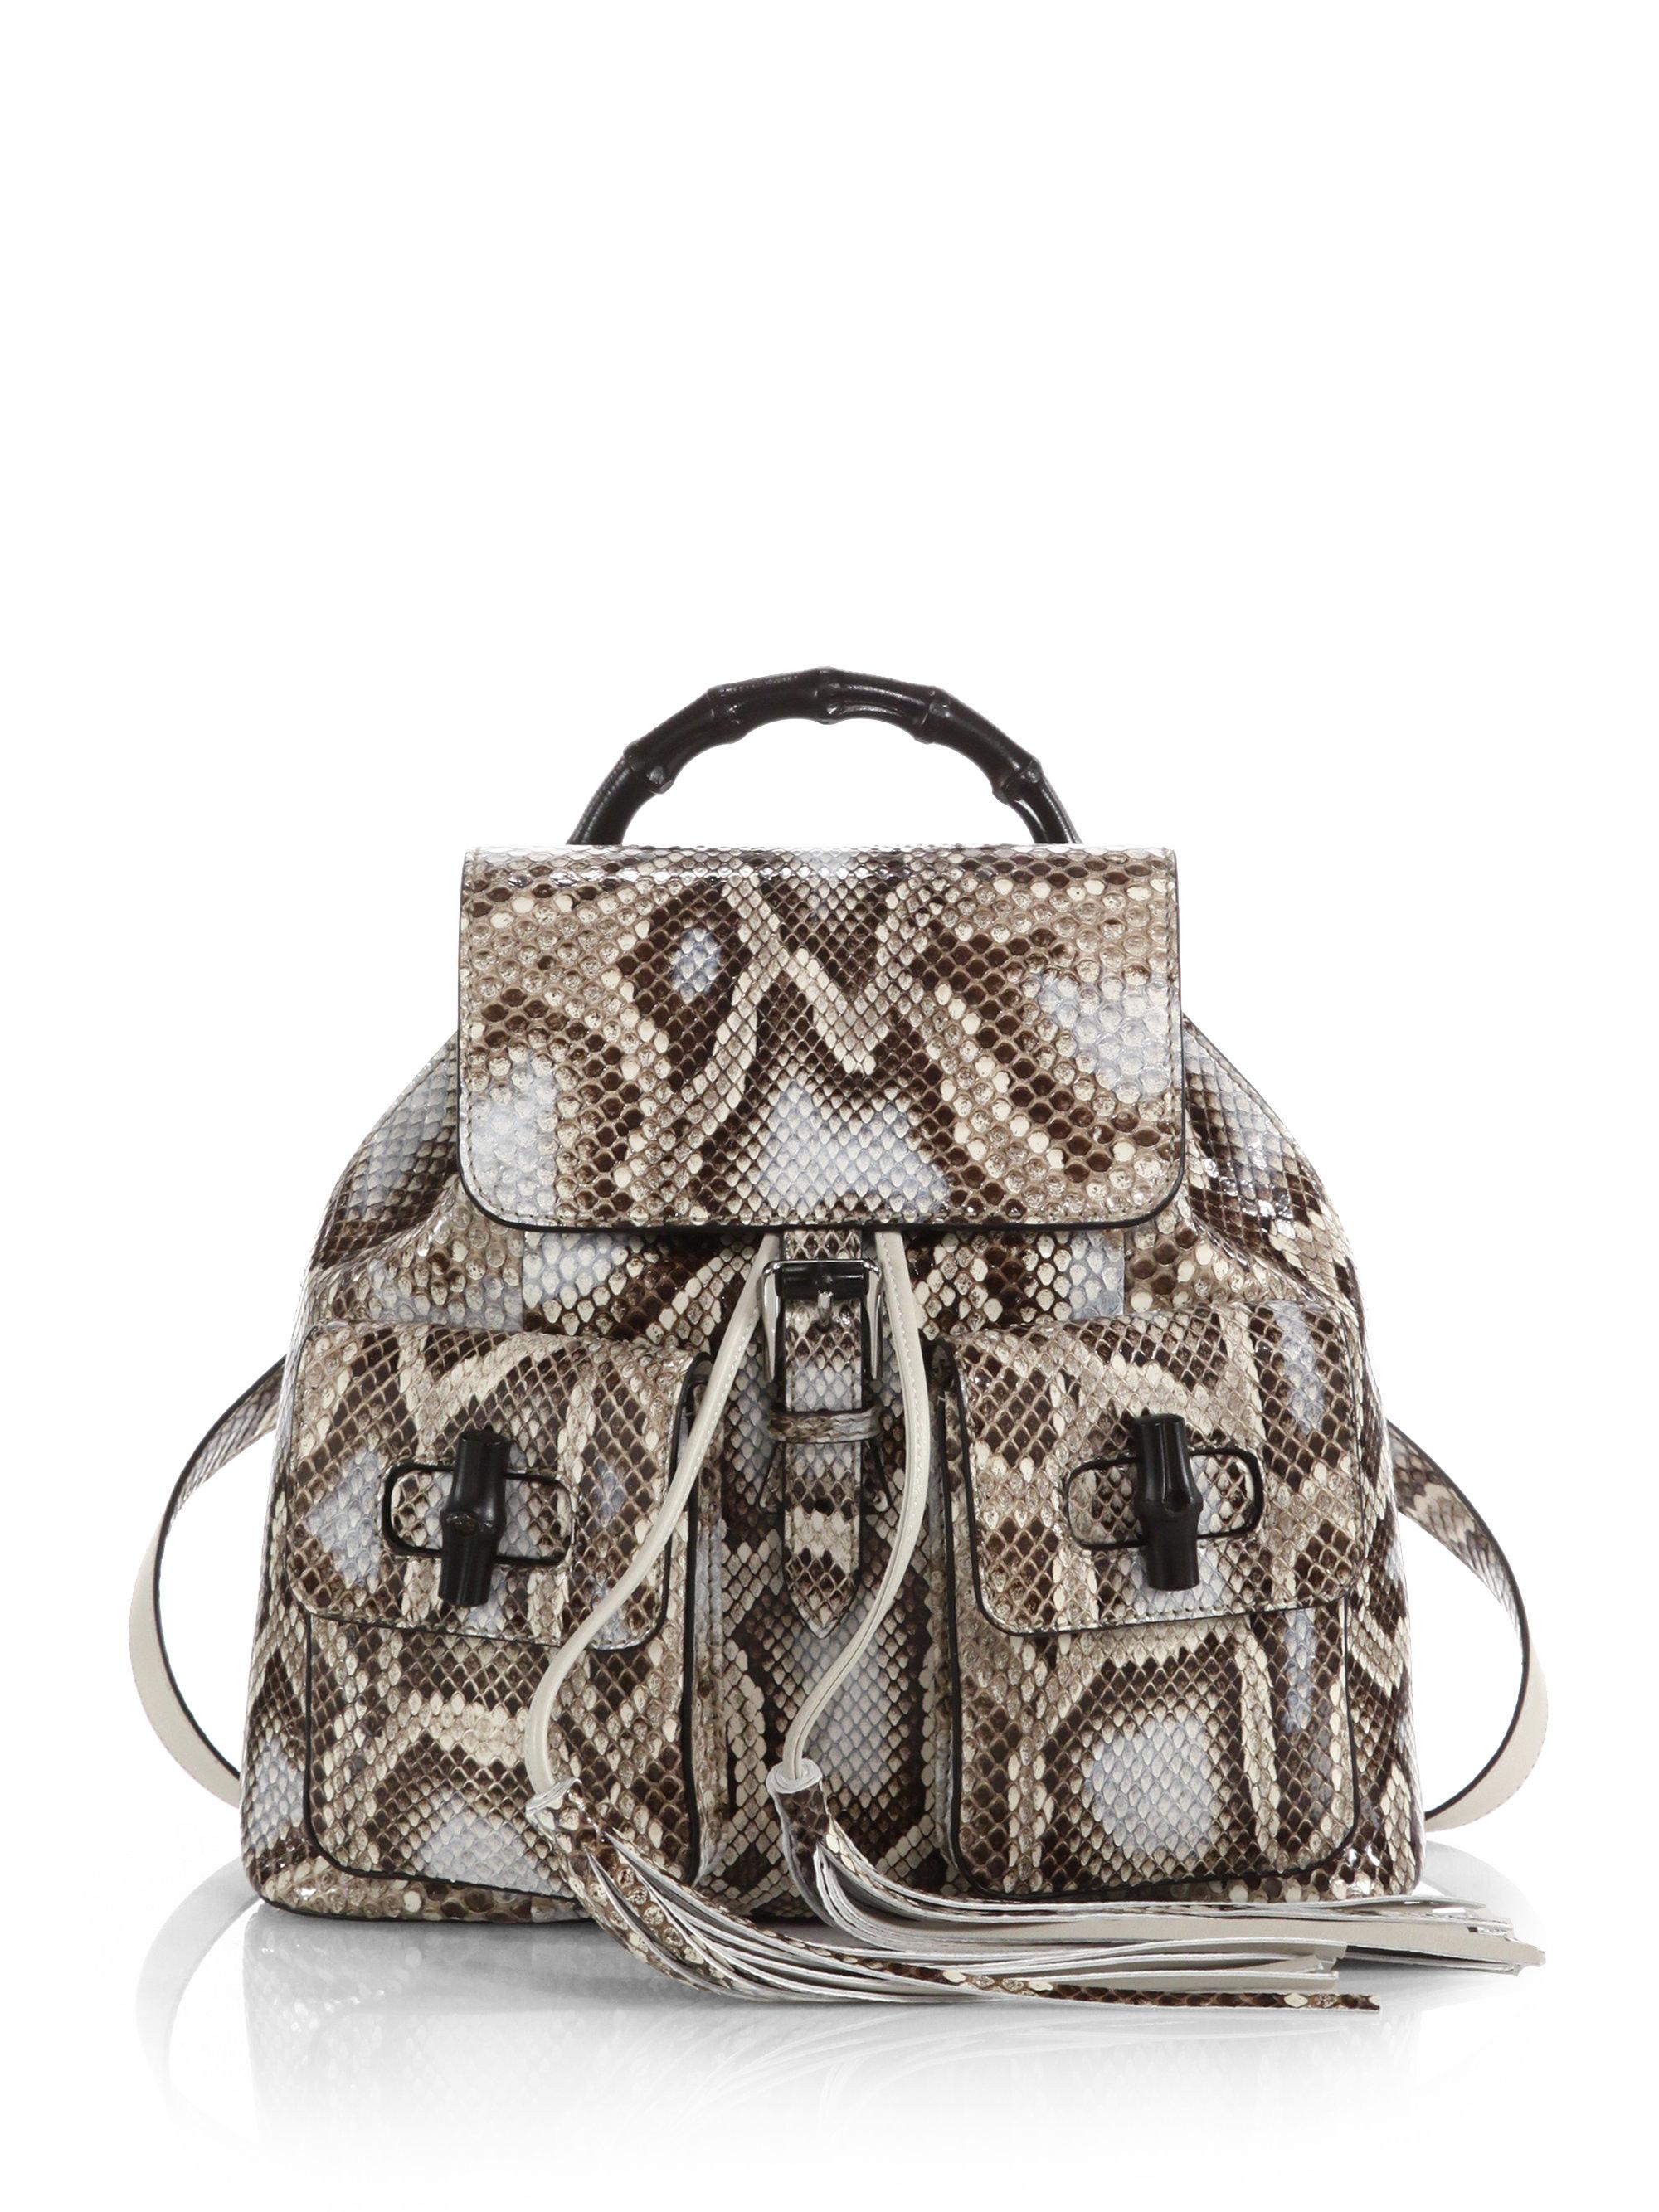 b2b69c3015efcb Gucci Bamboo Sac Python Backpack - Lyst